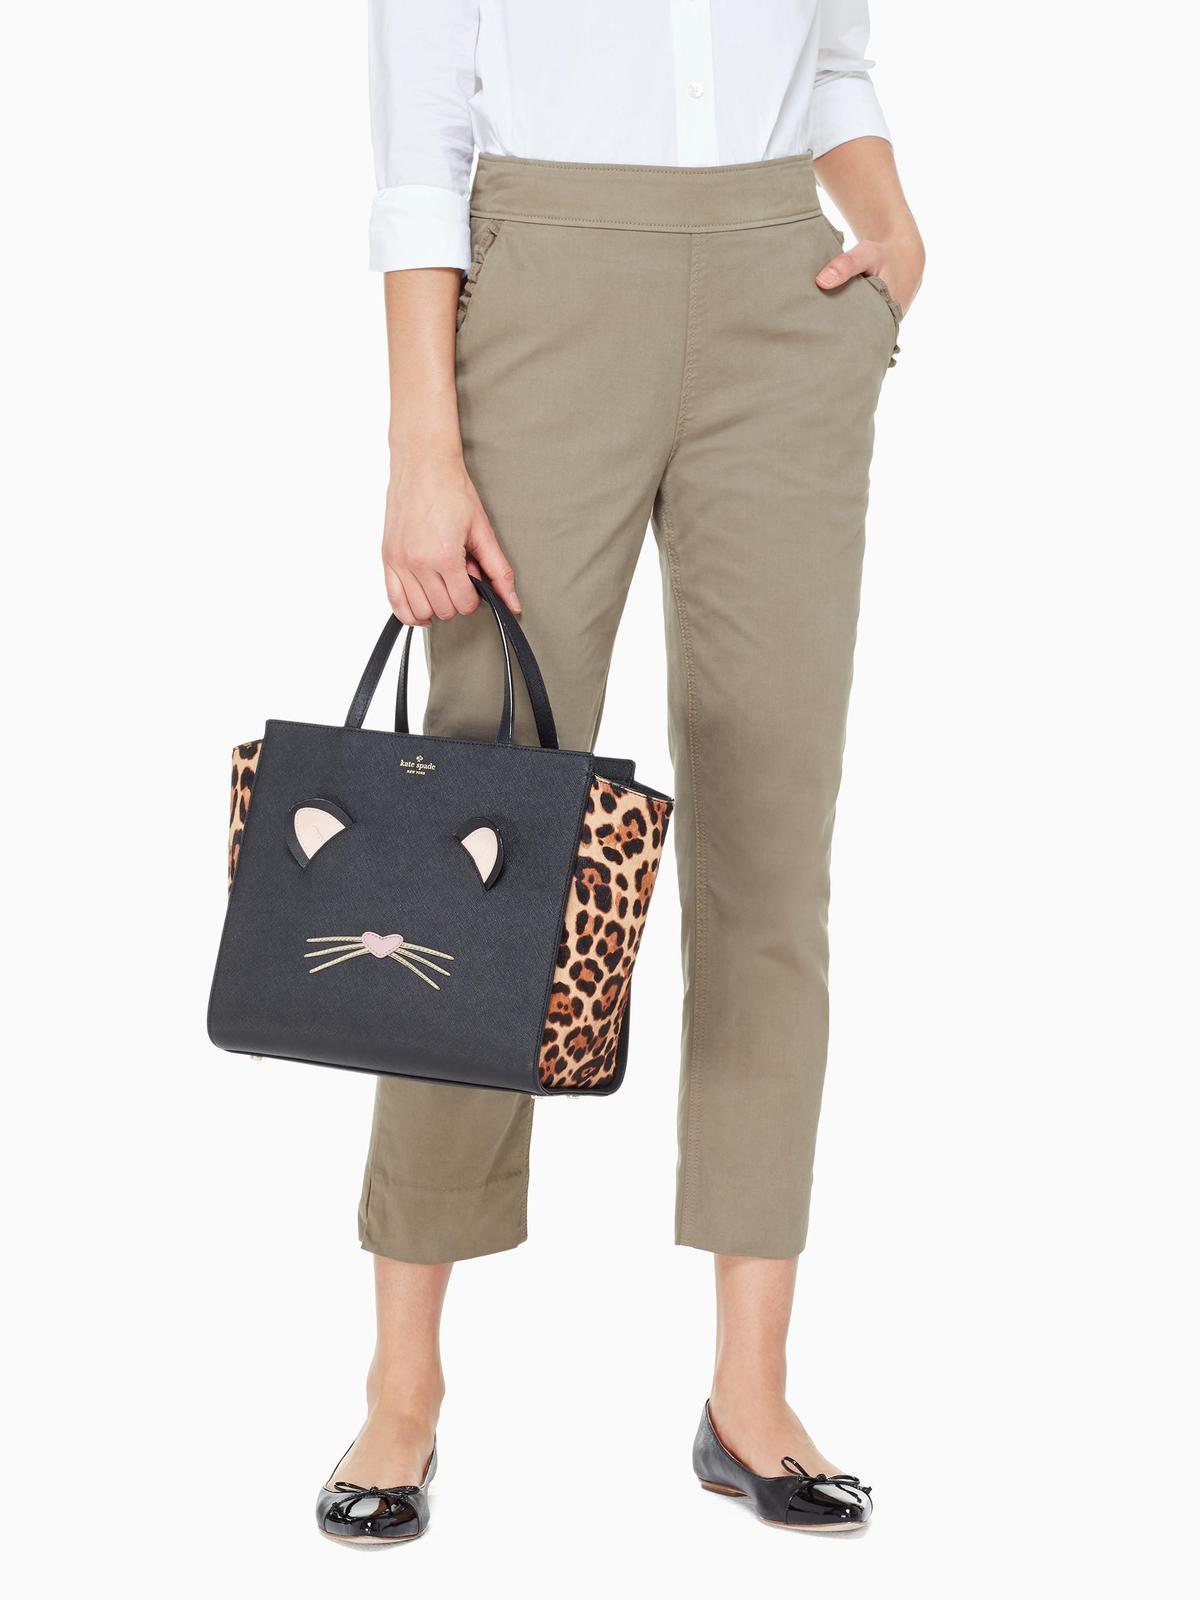 f2f19f89b872 6f1d1ffbd3c711681d5bffb5bdf7bf75. 6f1d1ffbd3c711681d5bffb5bdf7bf75.  Previous. NWT Kate Spade Leopard Hayden Run Wild Cat Large Satchel Bag